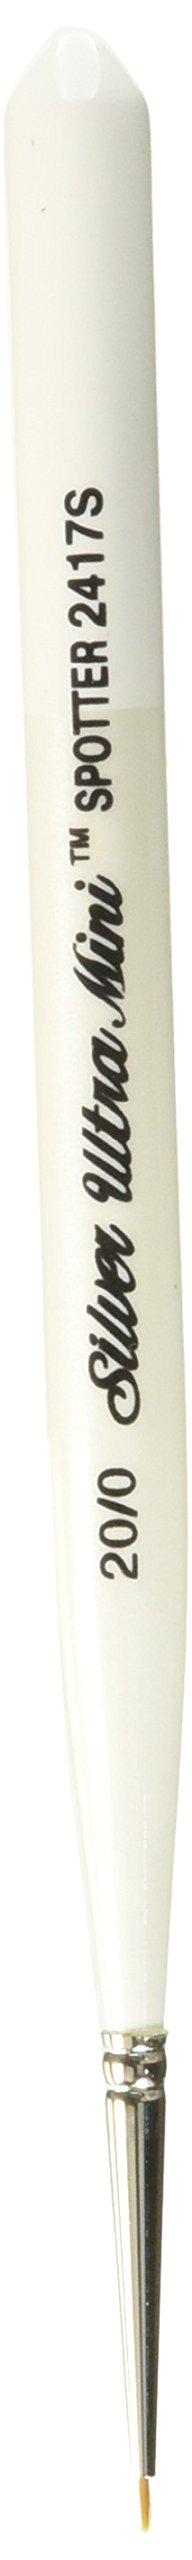 Silver Brush 2417S-20/0 Ultra Mini Short Handle Golden Taklon Brush, Spotter, Size 20/0 by Silver Brush Limited